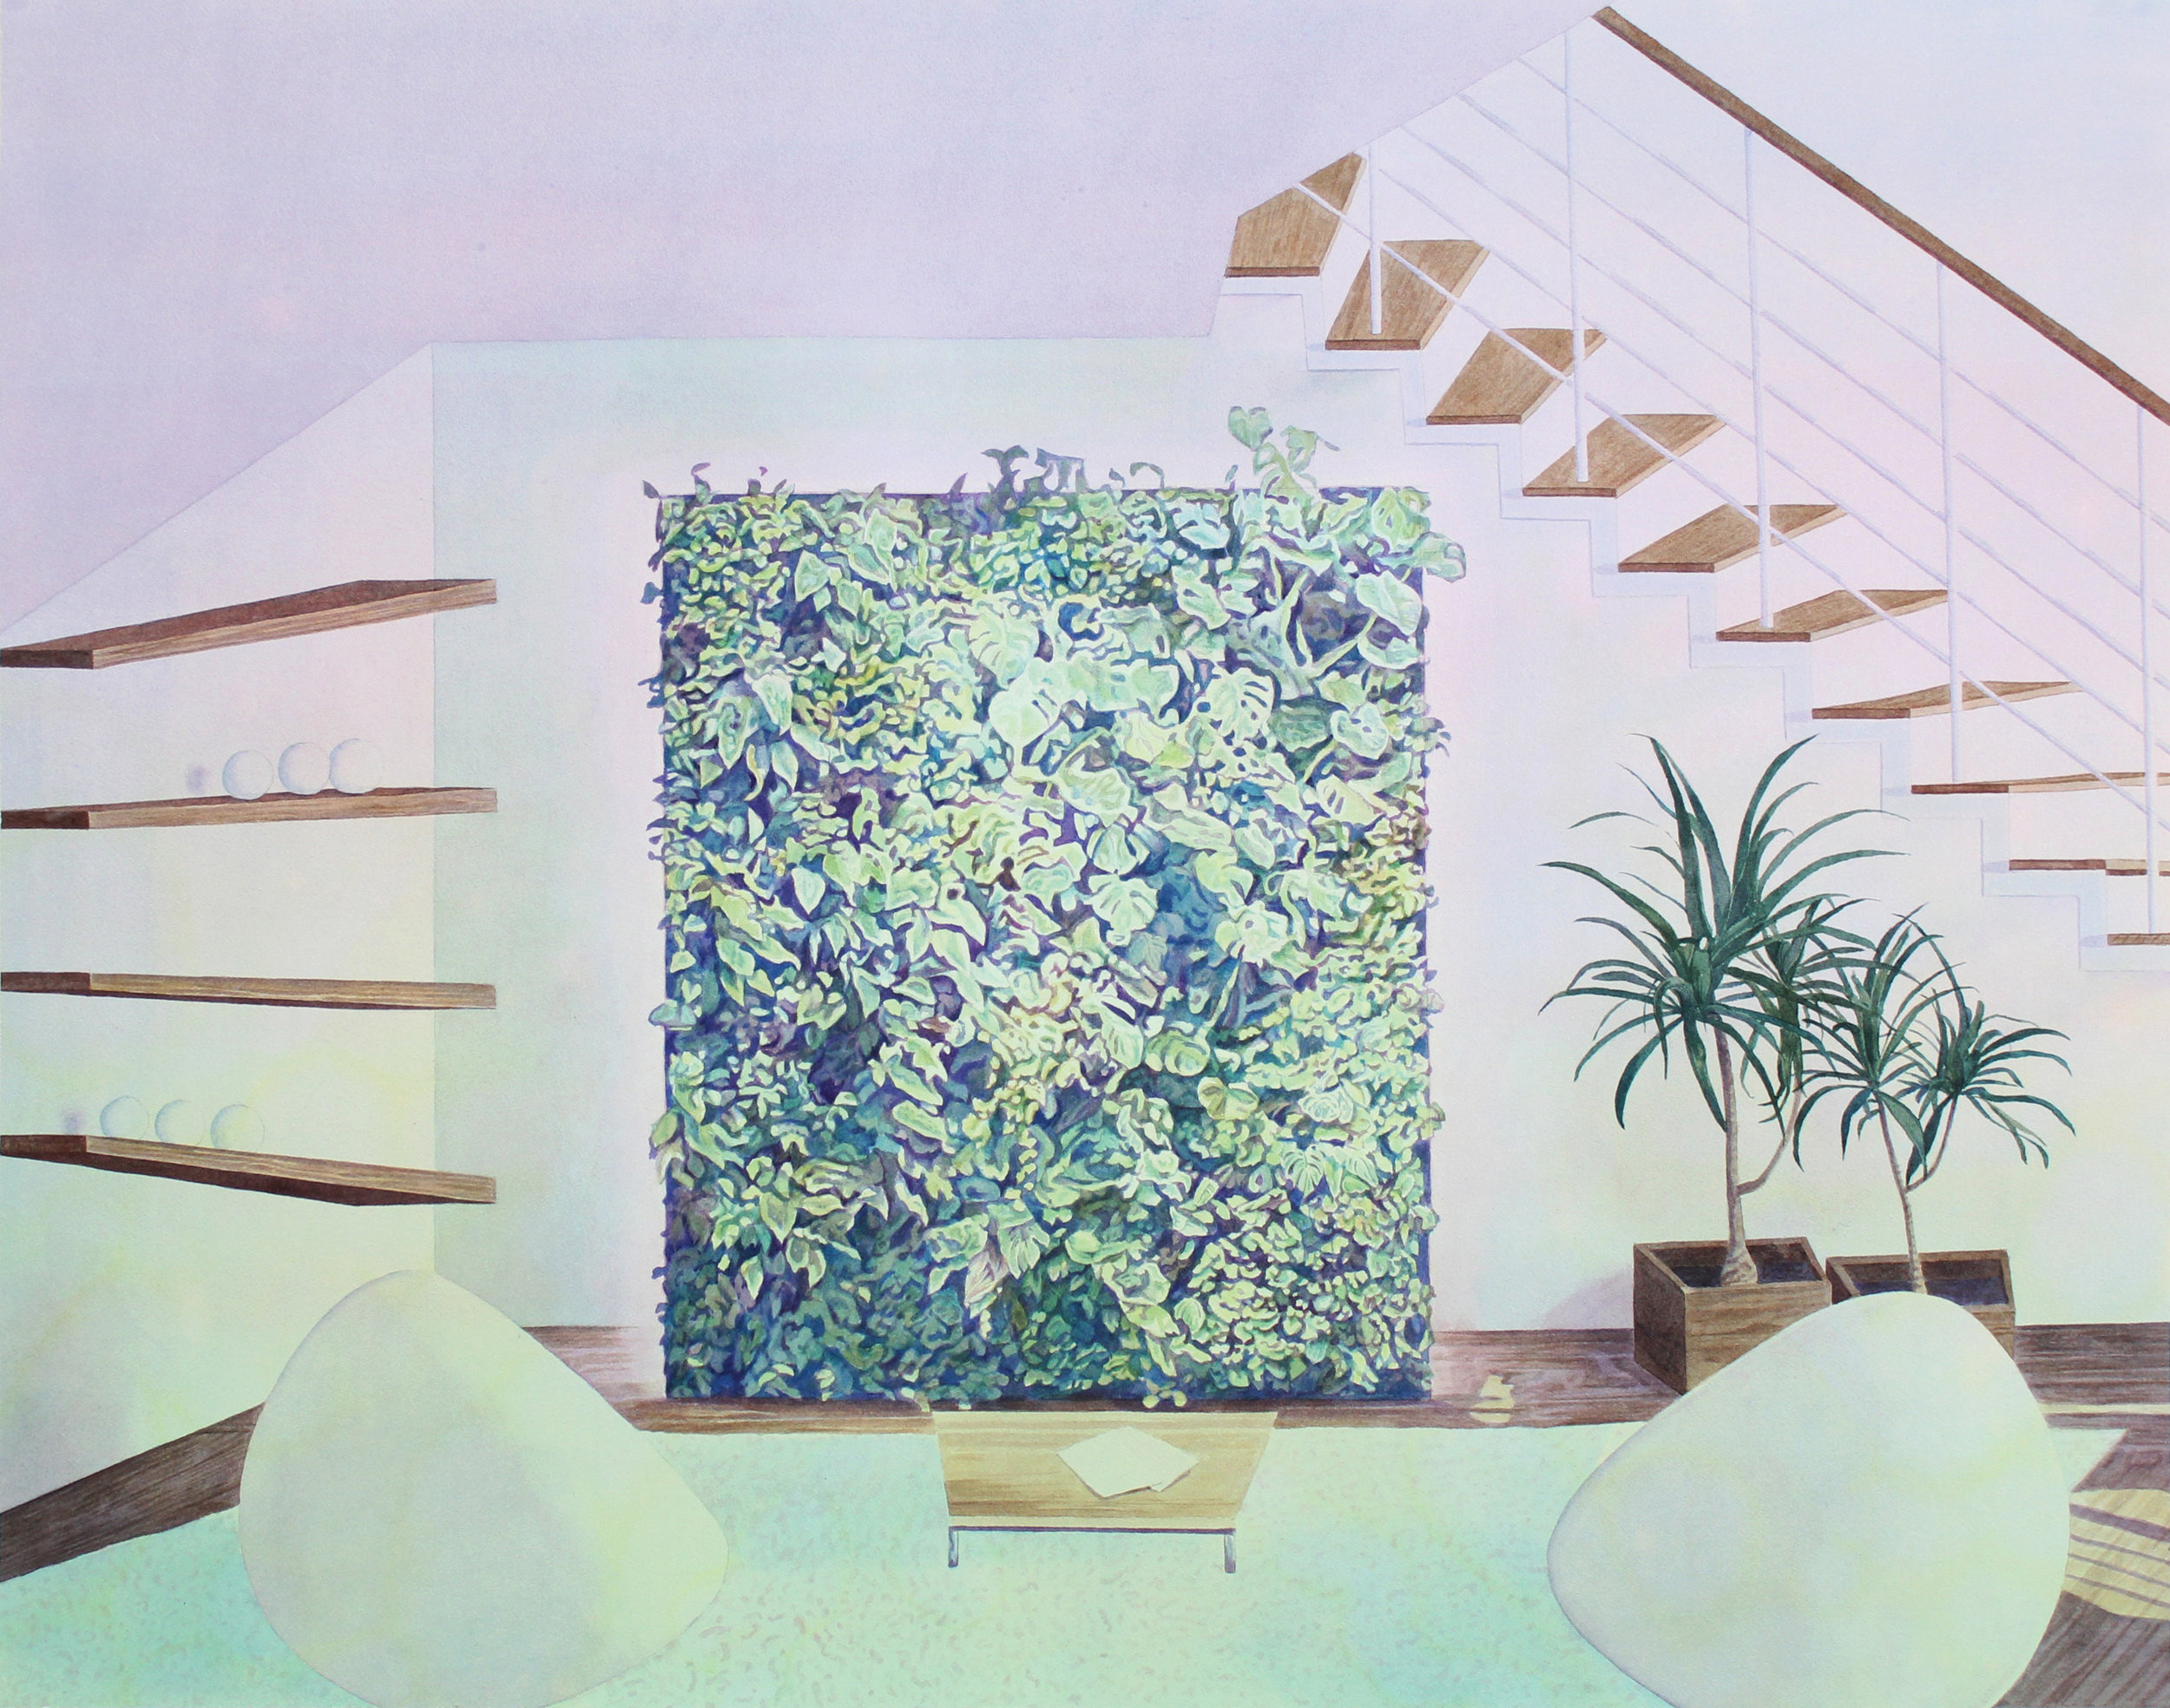 "Tristram Lansdowne,  Perpetual Growth , 2016, watercolour on paper in artist frame, 27.5"" x 34.5"" (69 x 88 cm)"